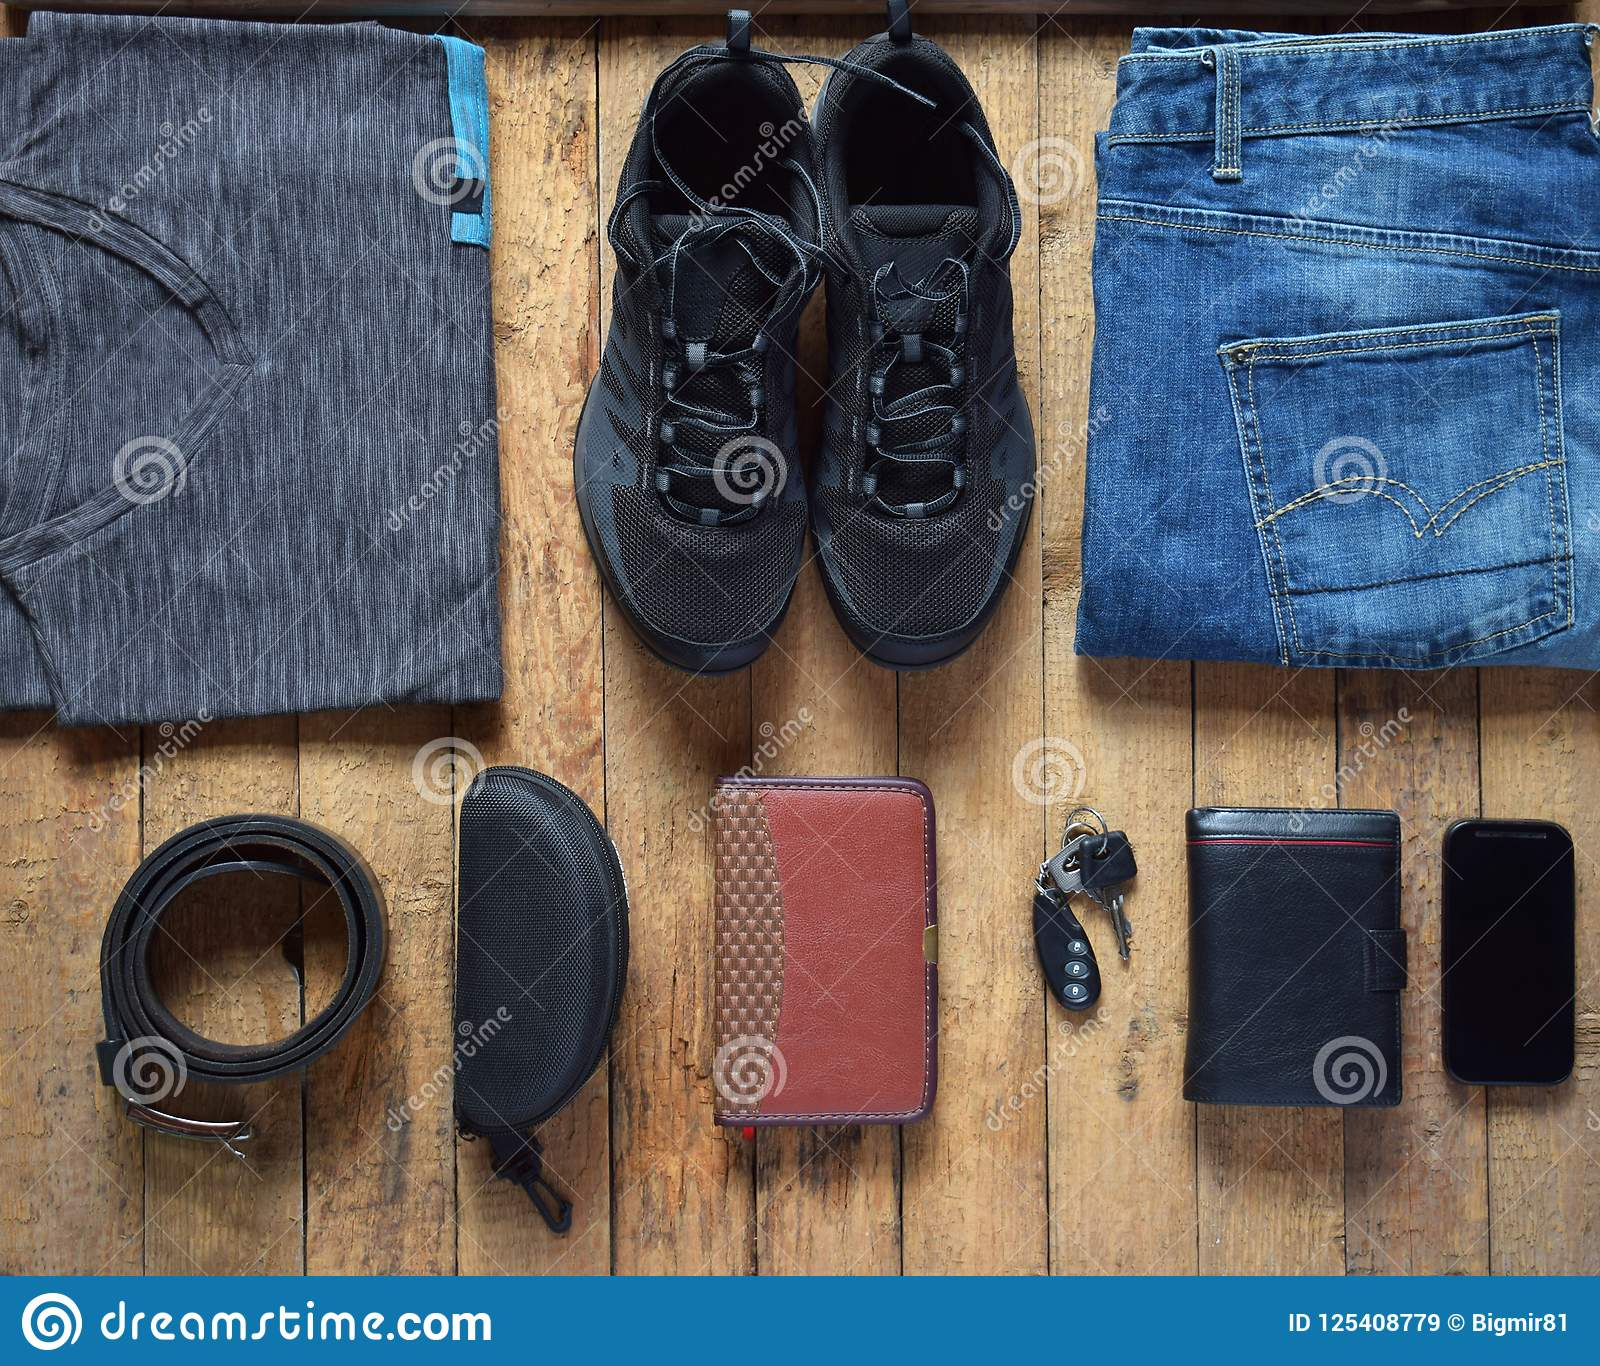 9fffb0d54bd Περιστασιακές εξαρτήσεις ατόμων Παπούτσια, ιματισμός και εξαρτήματα ατόμων  στο ξύλινο υπόβαθρο - γκρίζα μπλούζα,